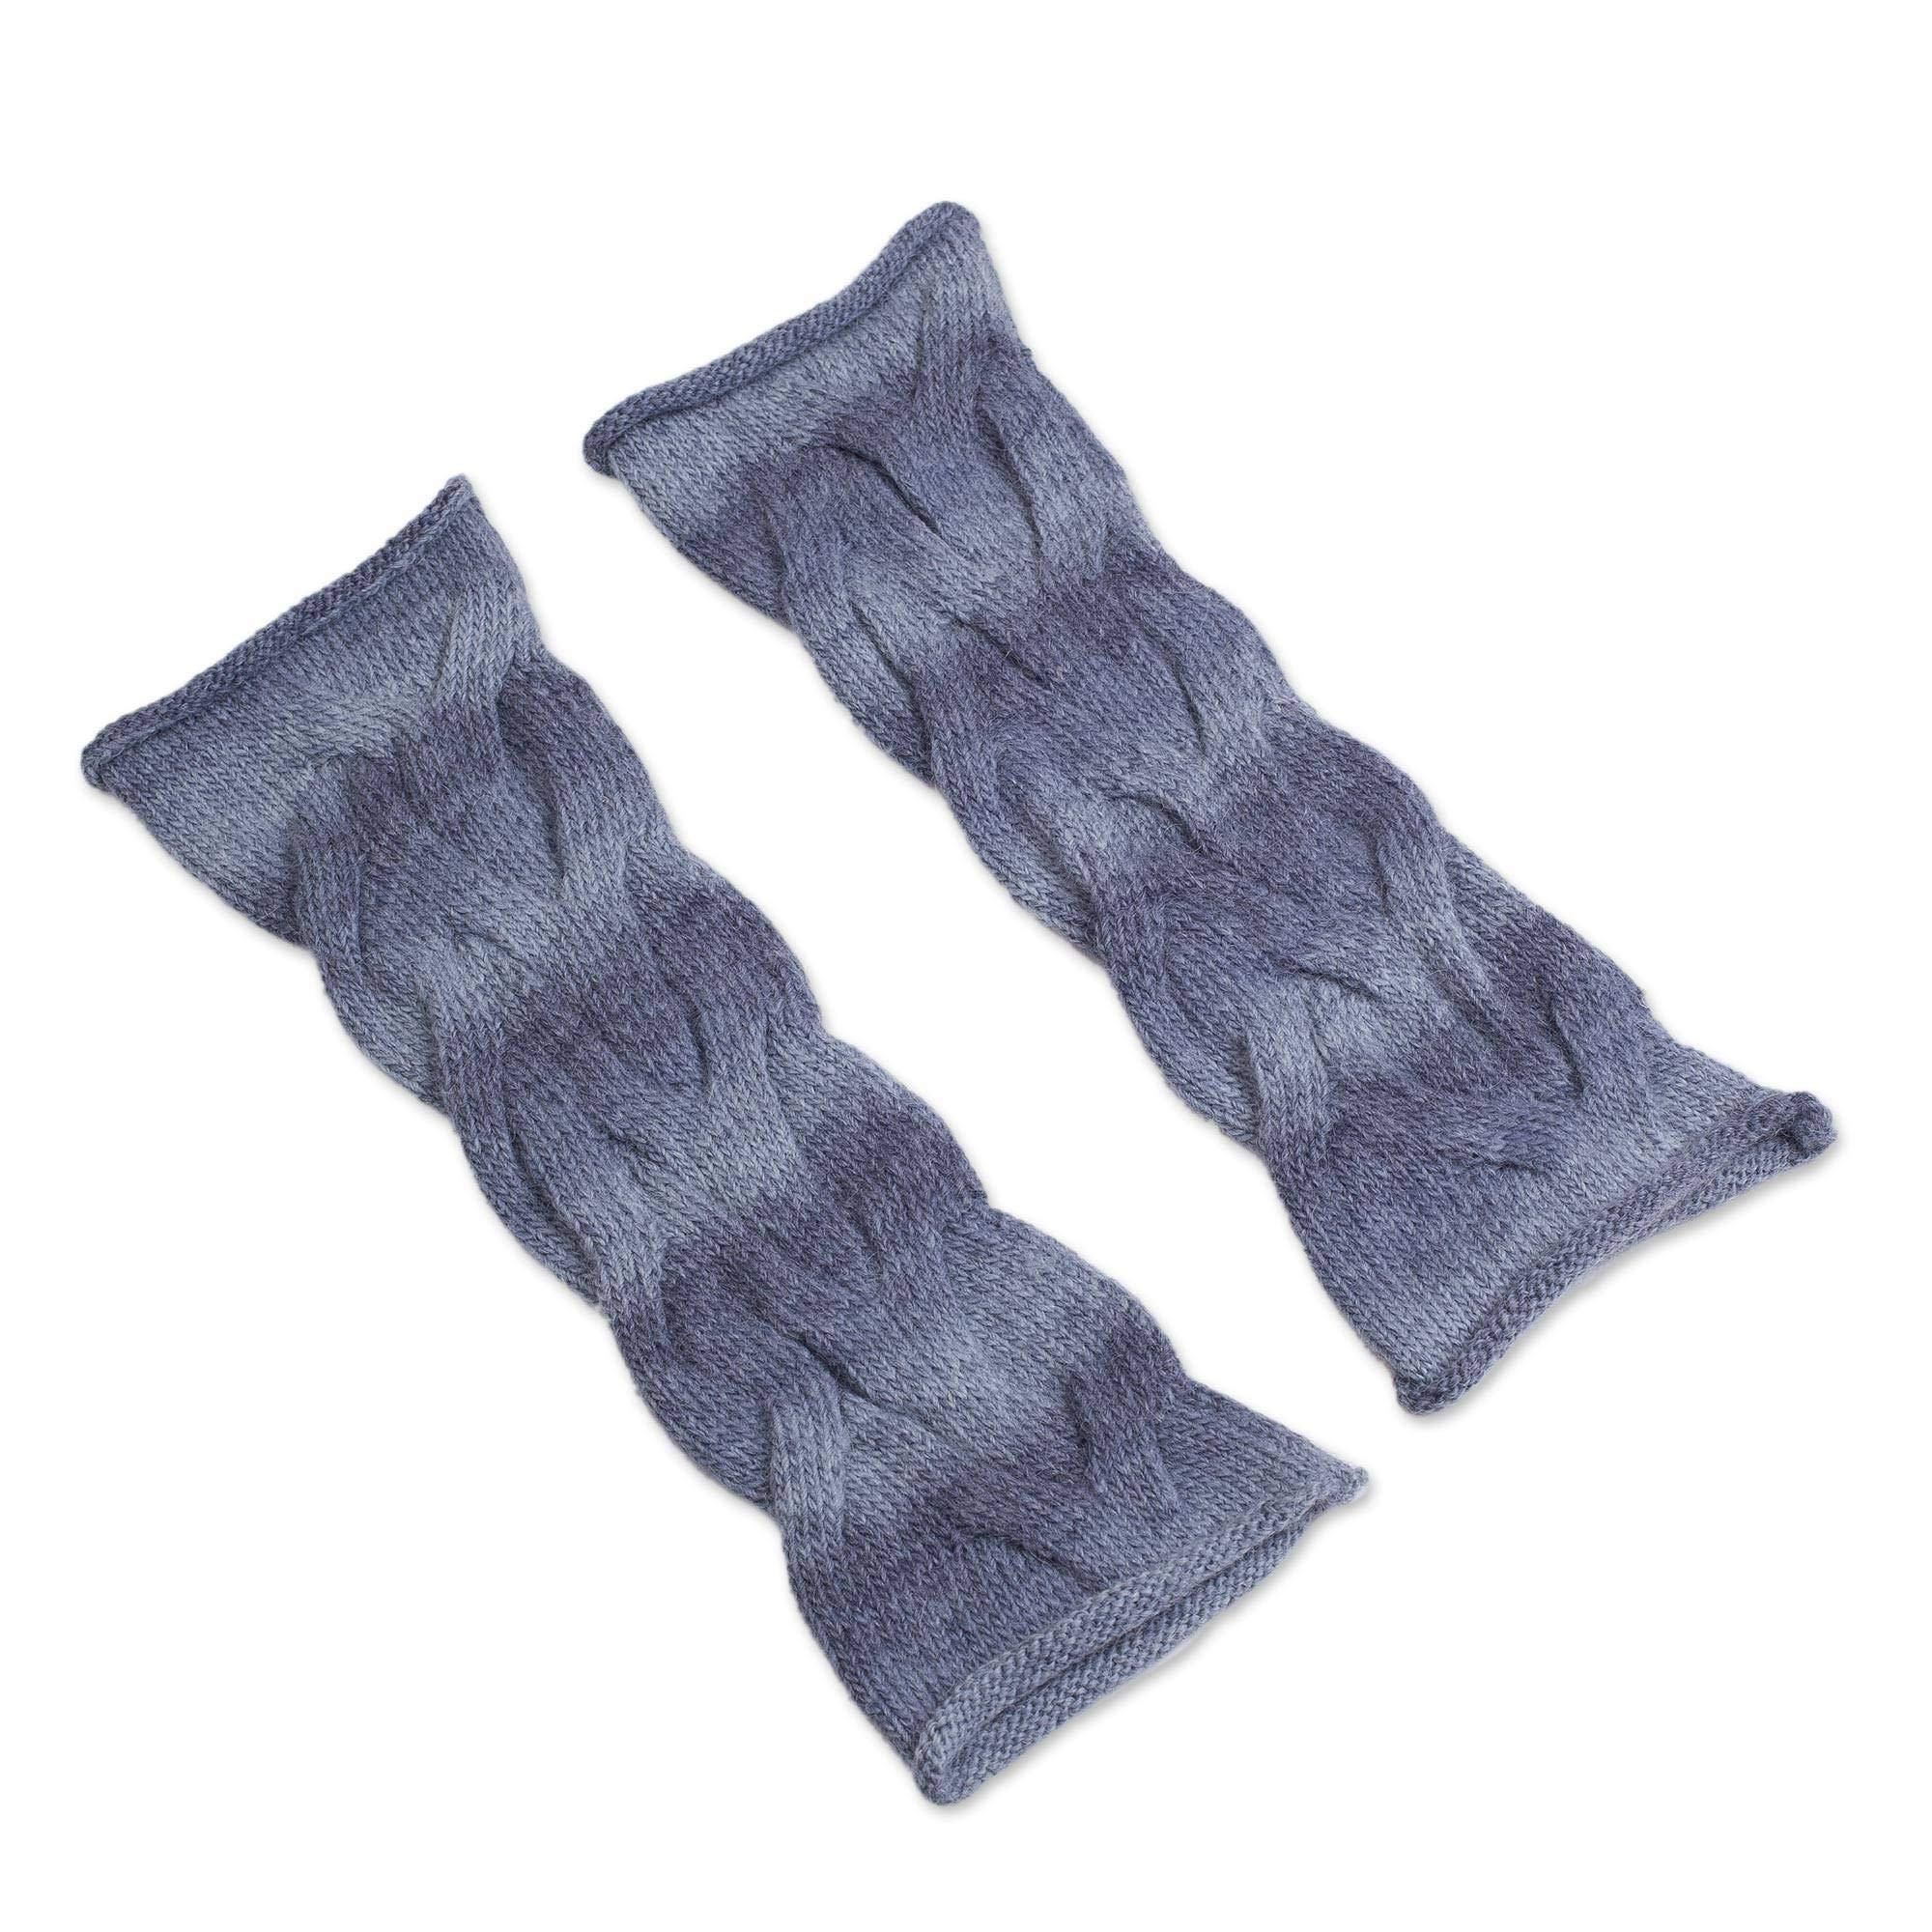 NOVICA Blue Alpaca Blend Leg Warmers, Stormy Sea' by NOVICA